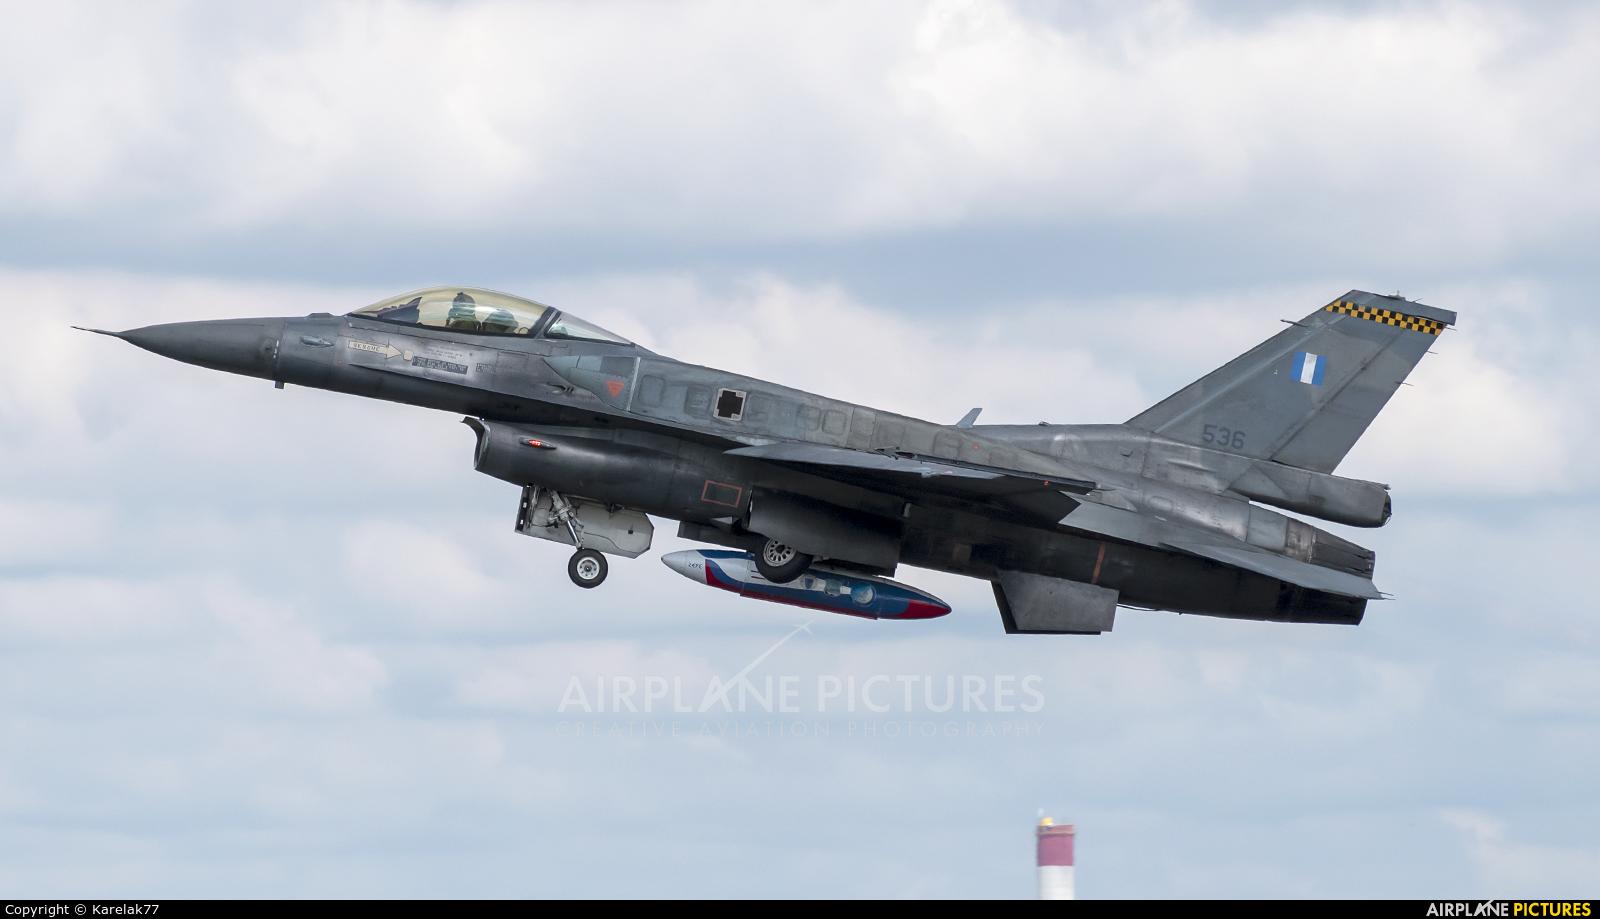 Greece - Hellenic Air Force 536 aircraft at Radom - Sadków